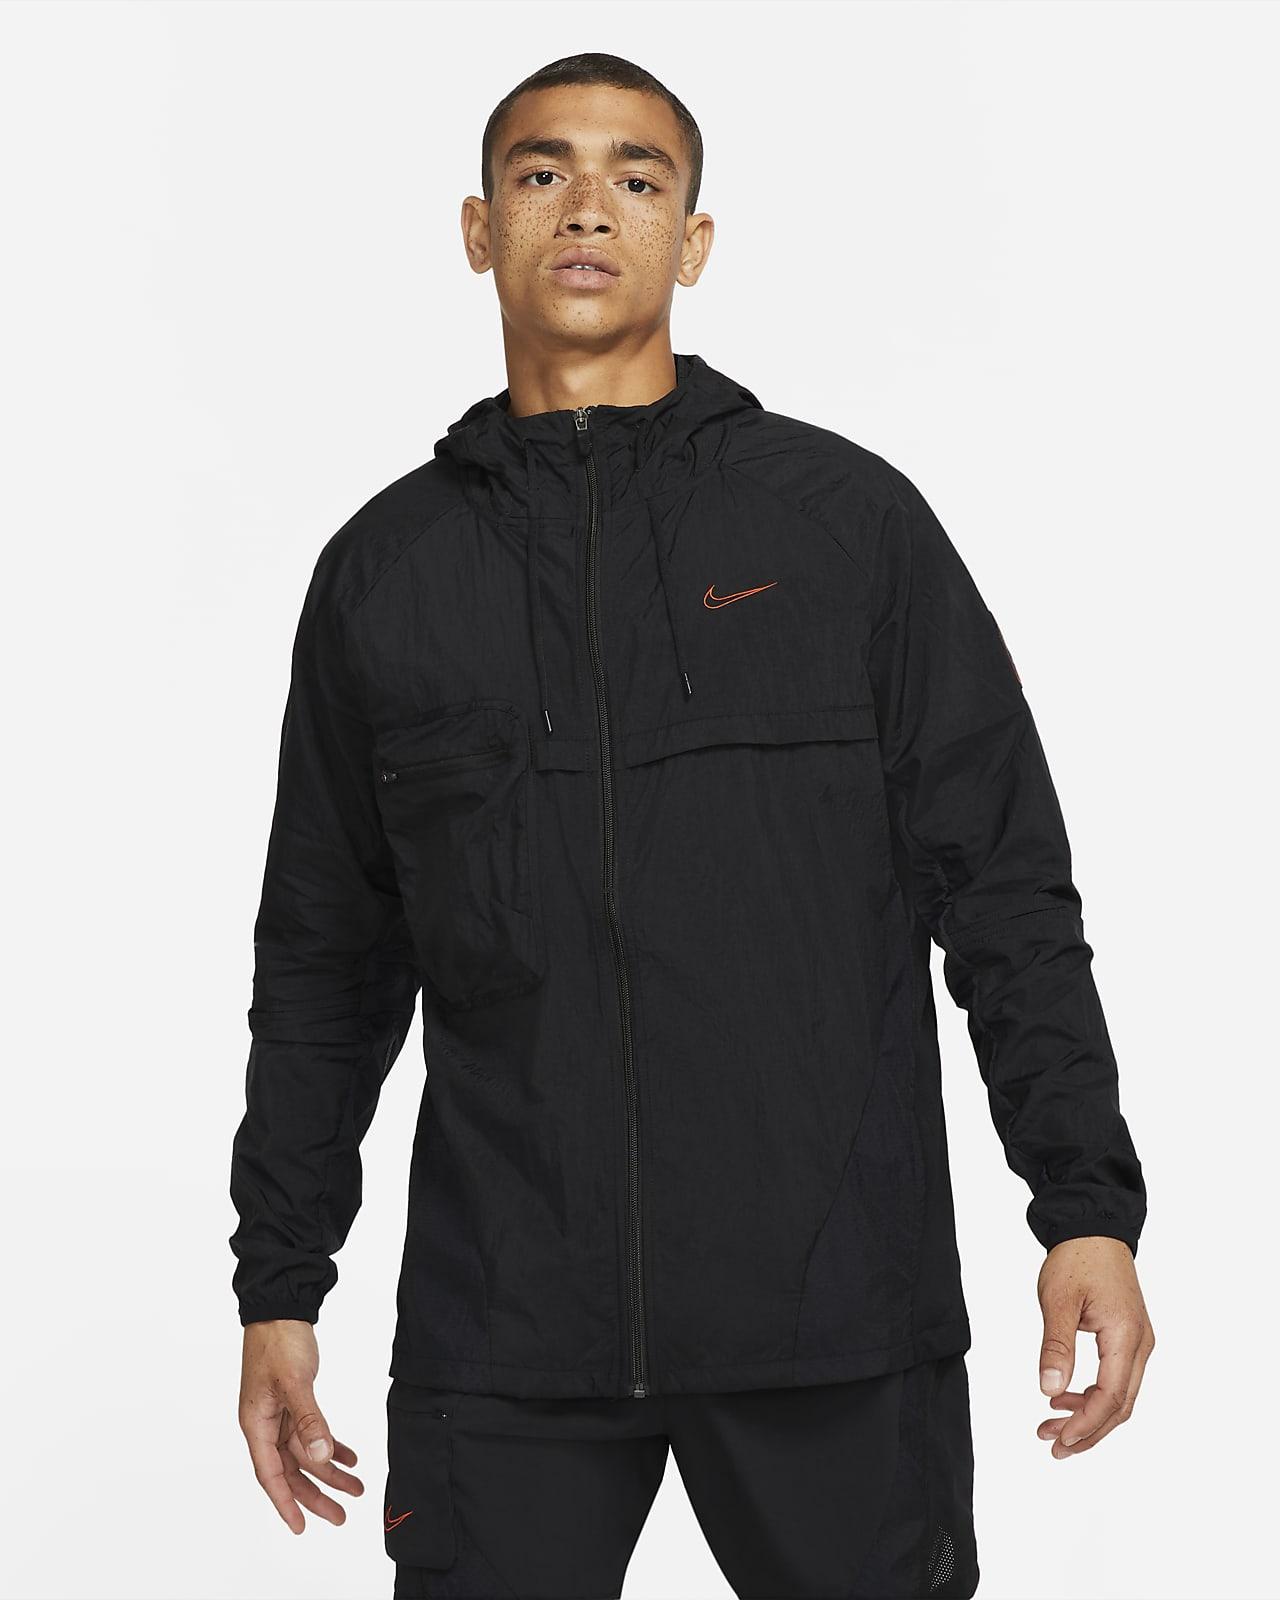 Nike Men's Full-Zip Training Jacket